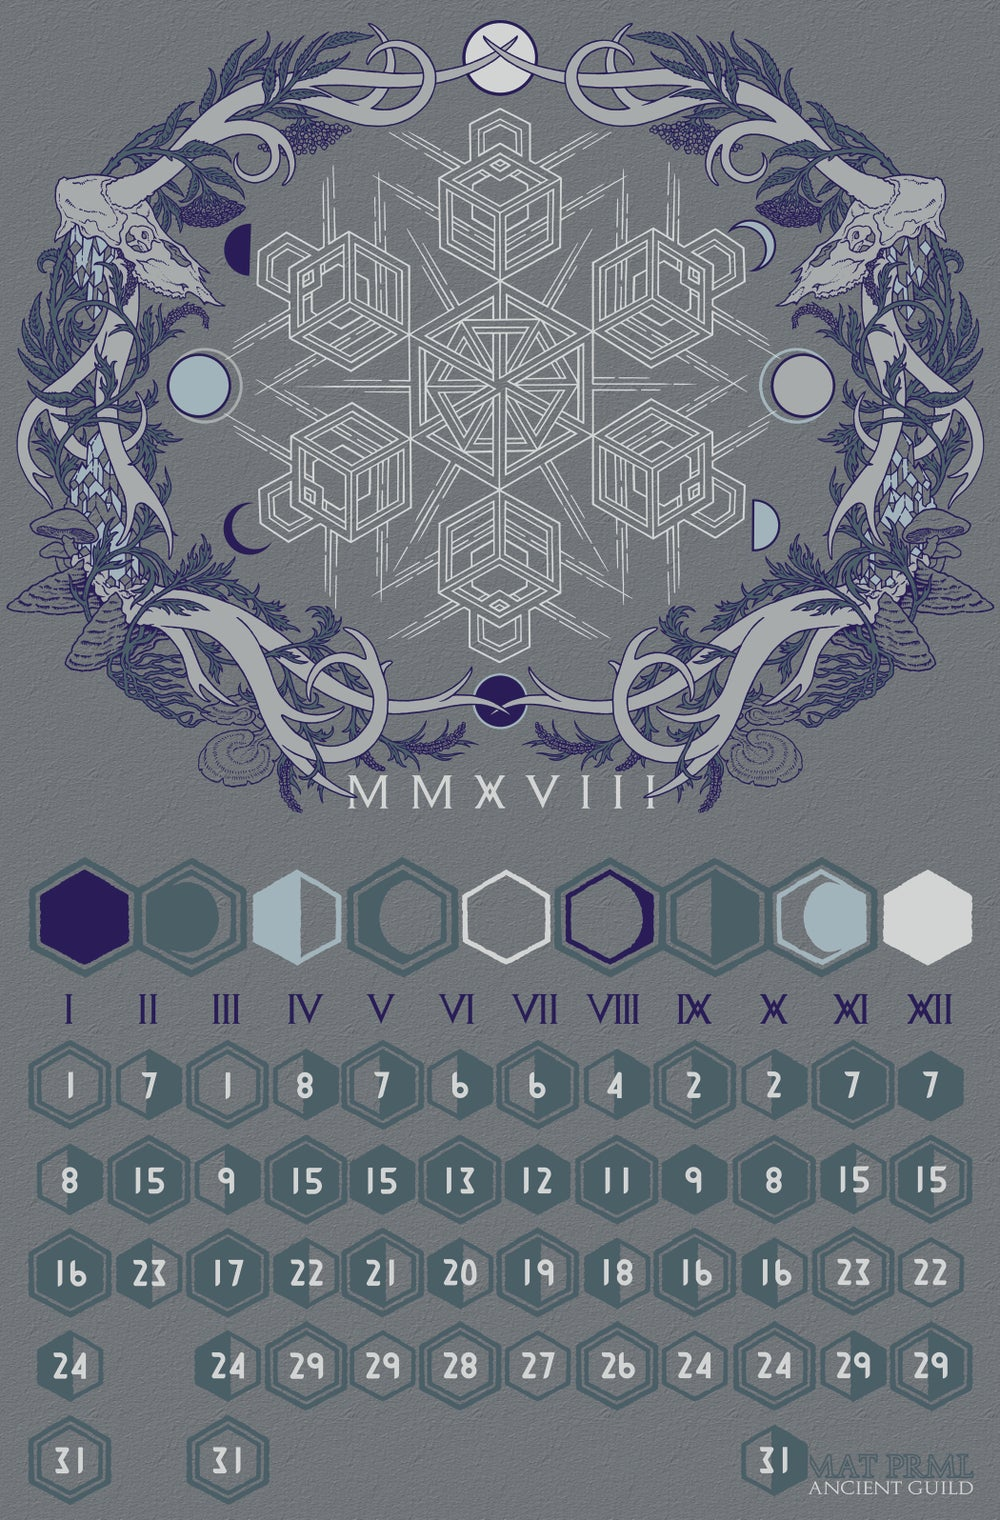 Image of ANCIENT GVILD // MMXVIII LVNAR CALENDAR